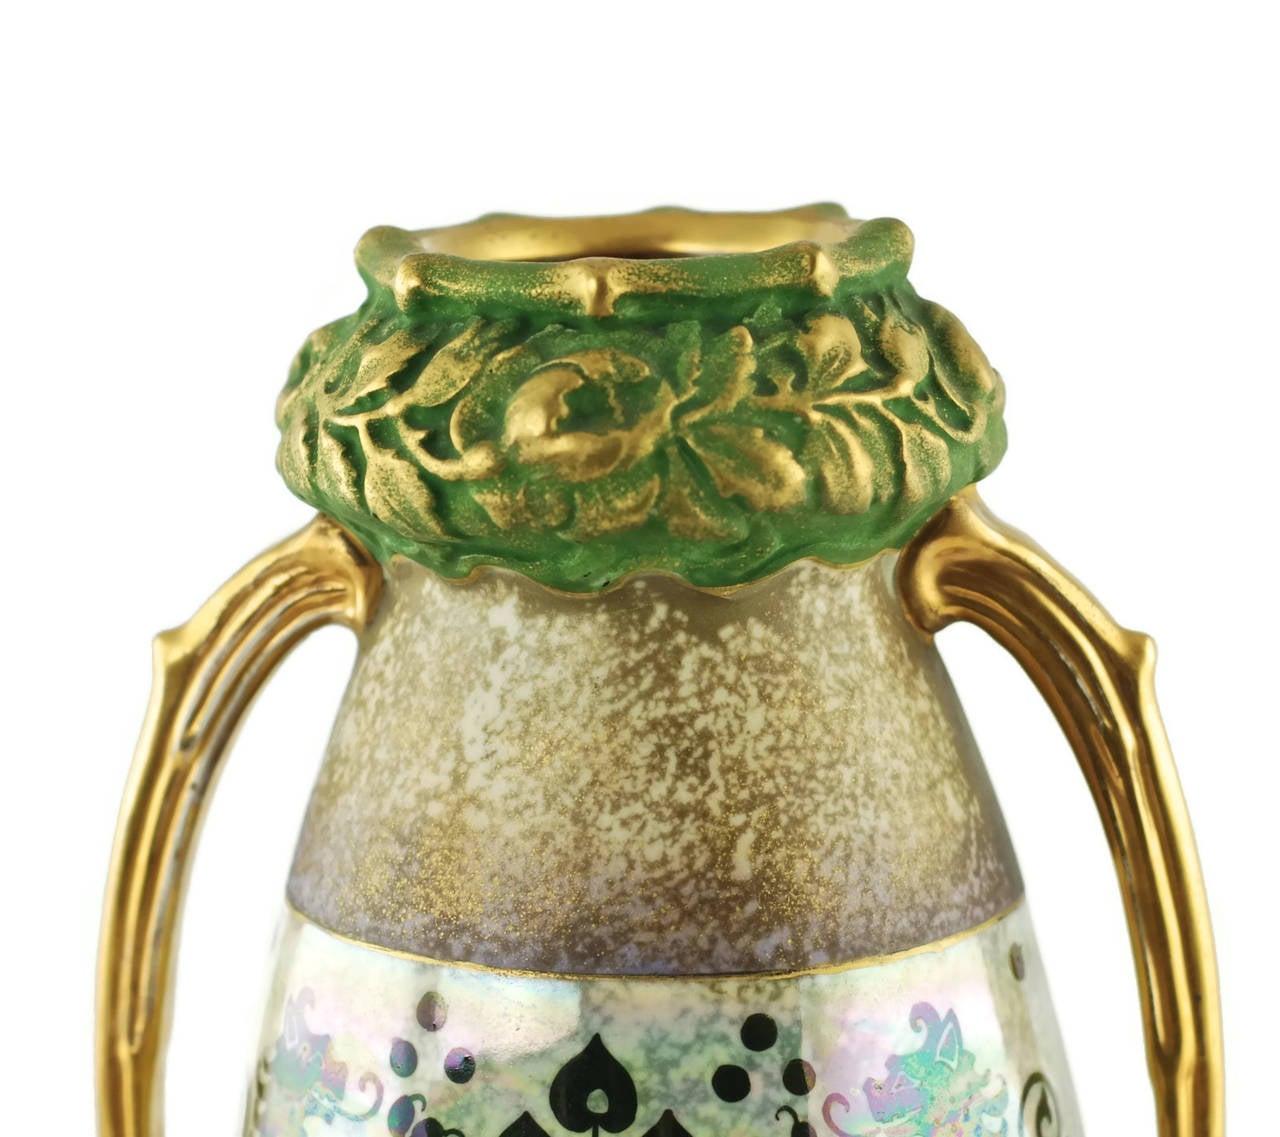 Polychromed Riessner & Kessel Amphora Turn Teplitz Two-Handled Vase with Iridized Glaze For Sale